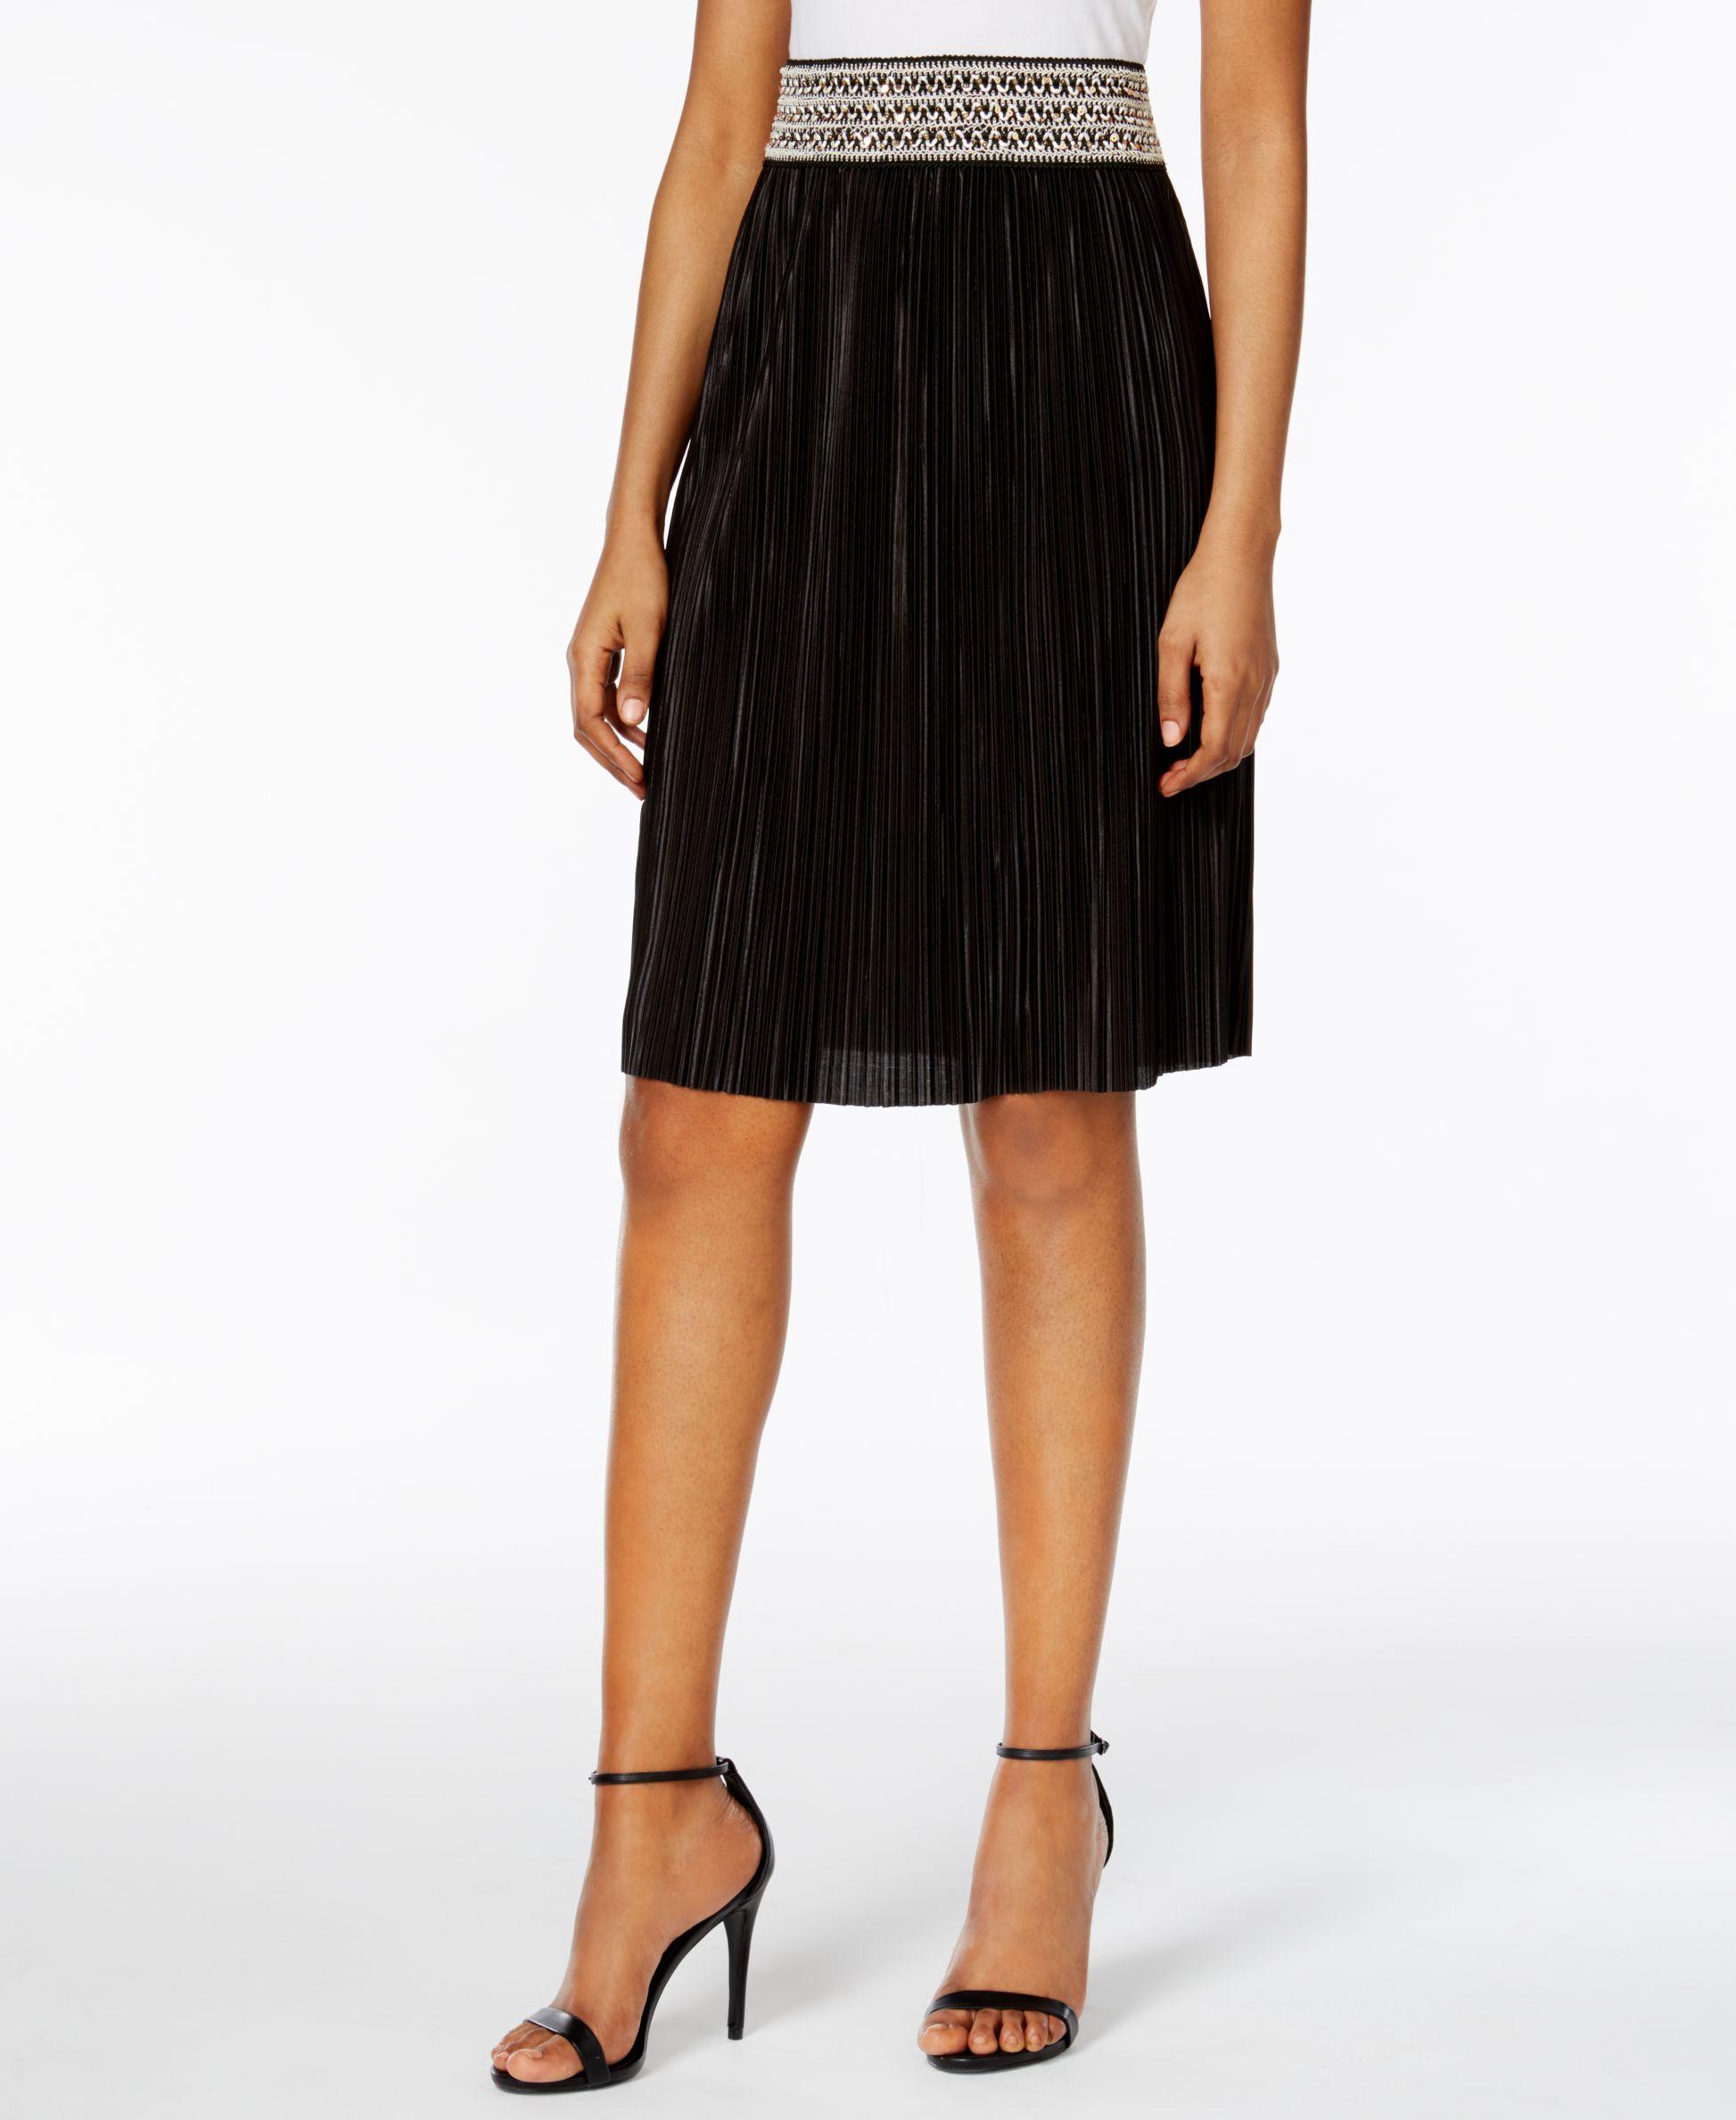 Msk Sequined A-Line Skirt